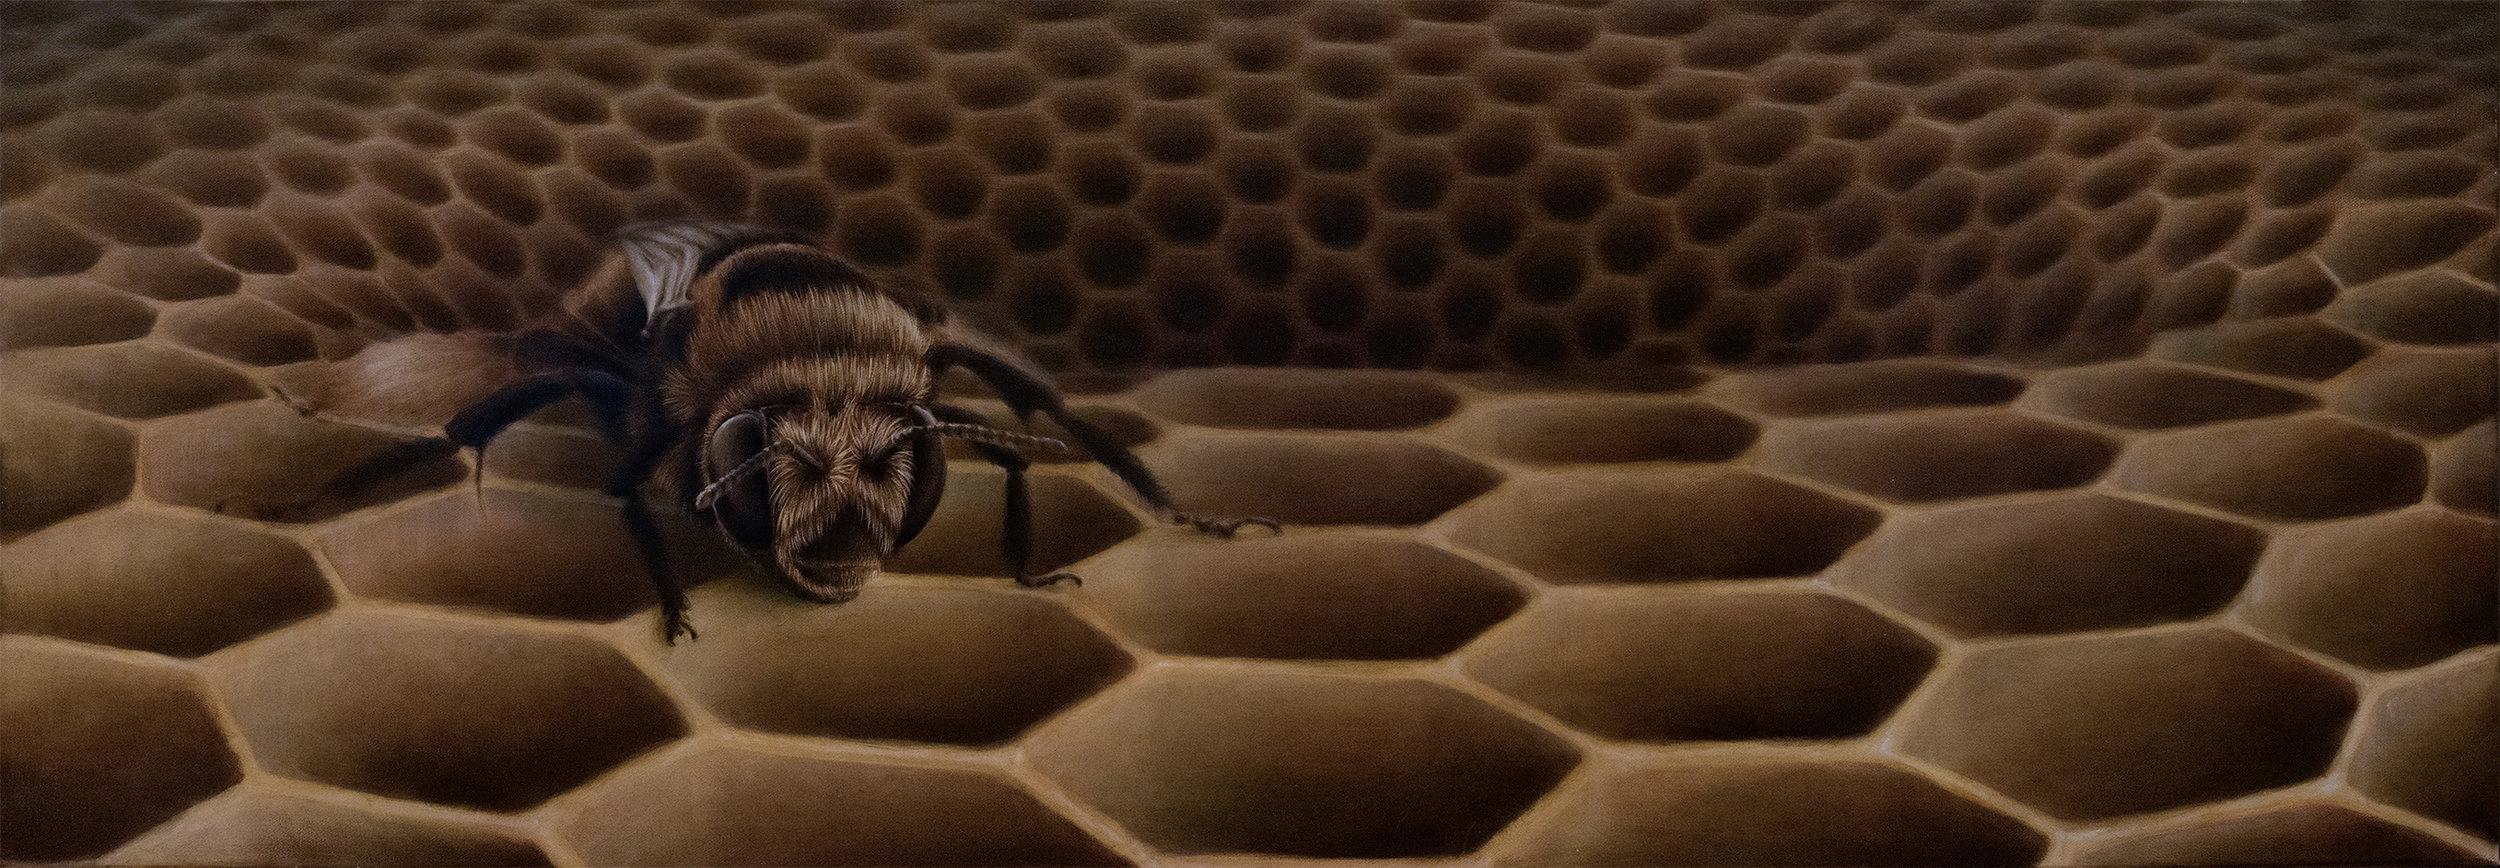 The+last+Bee@0,25x.jpg